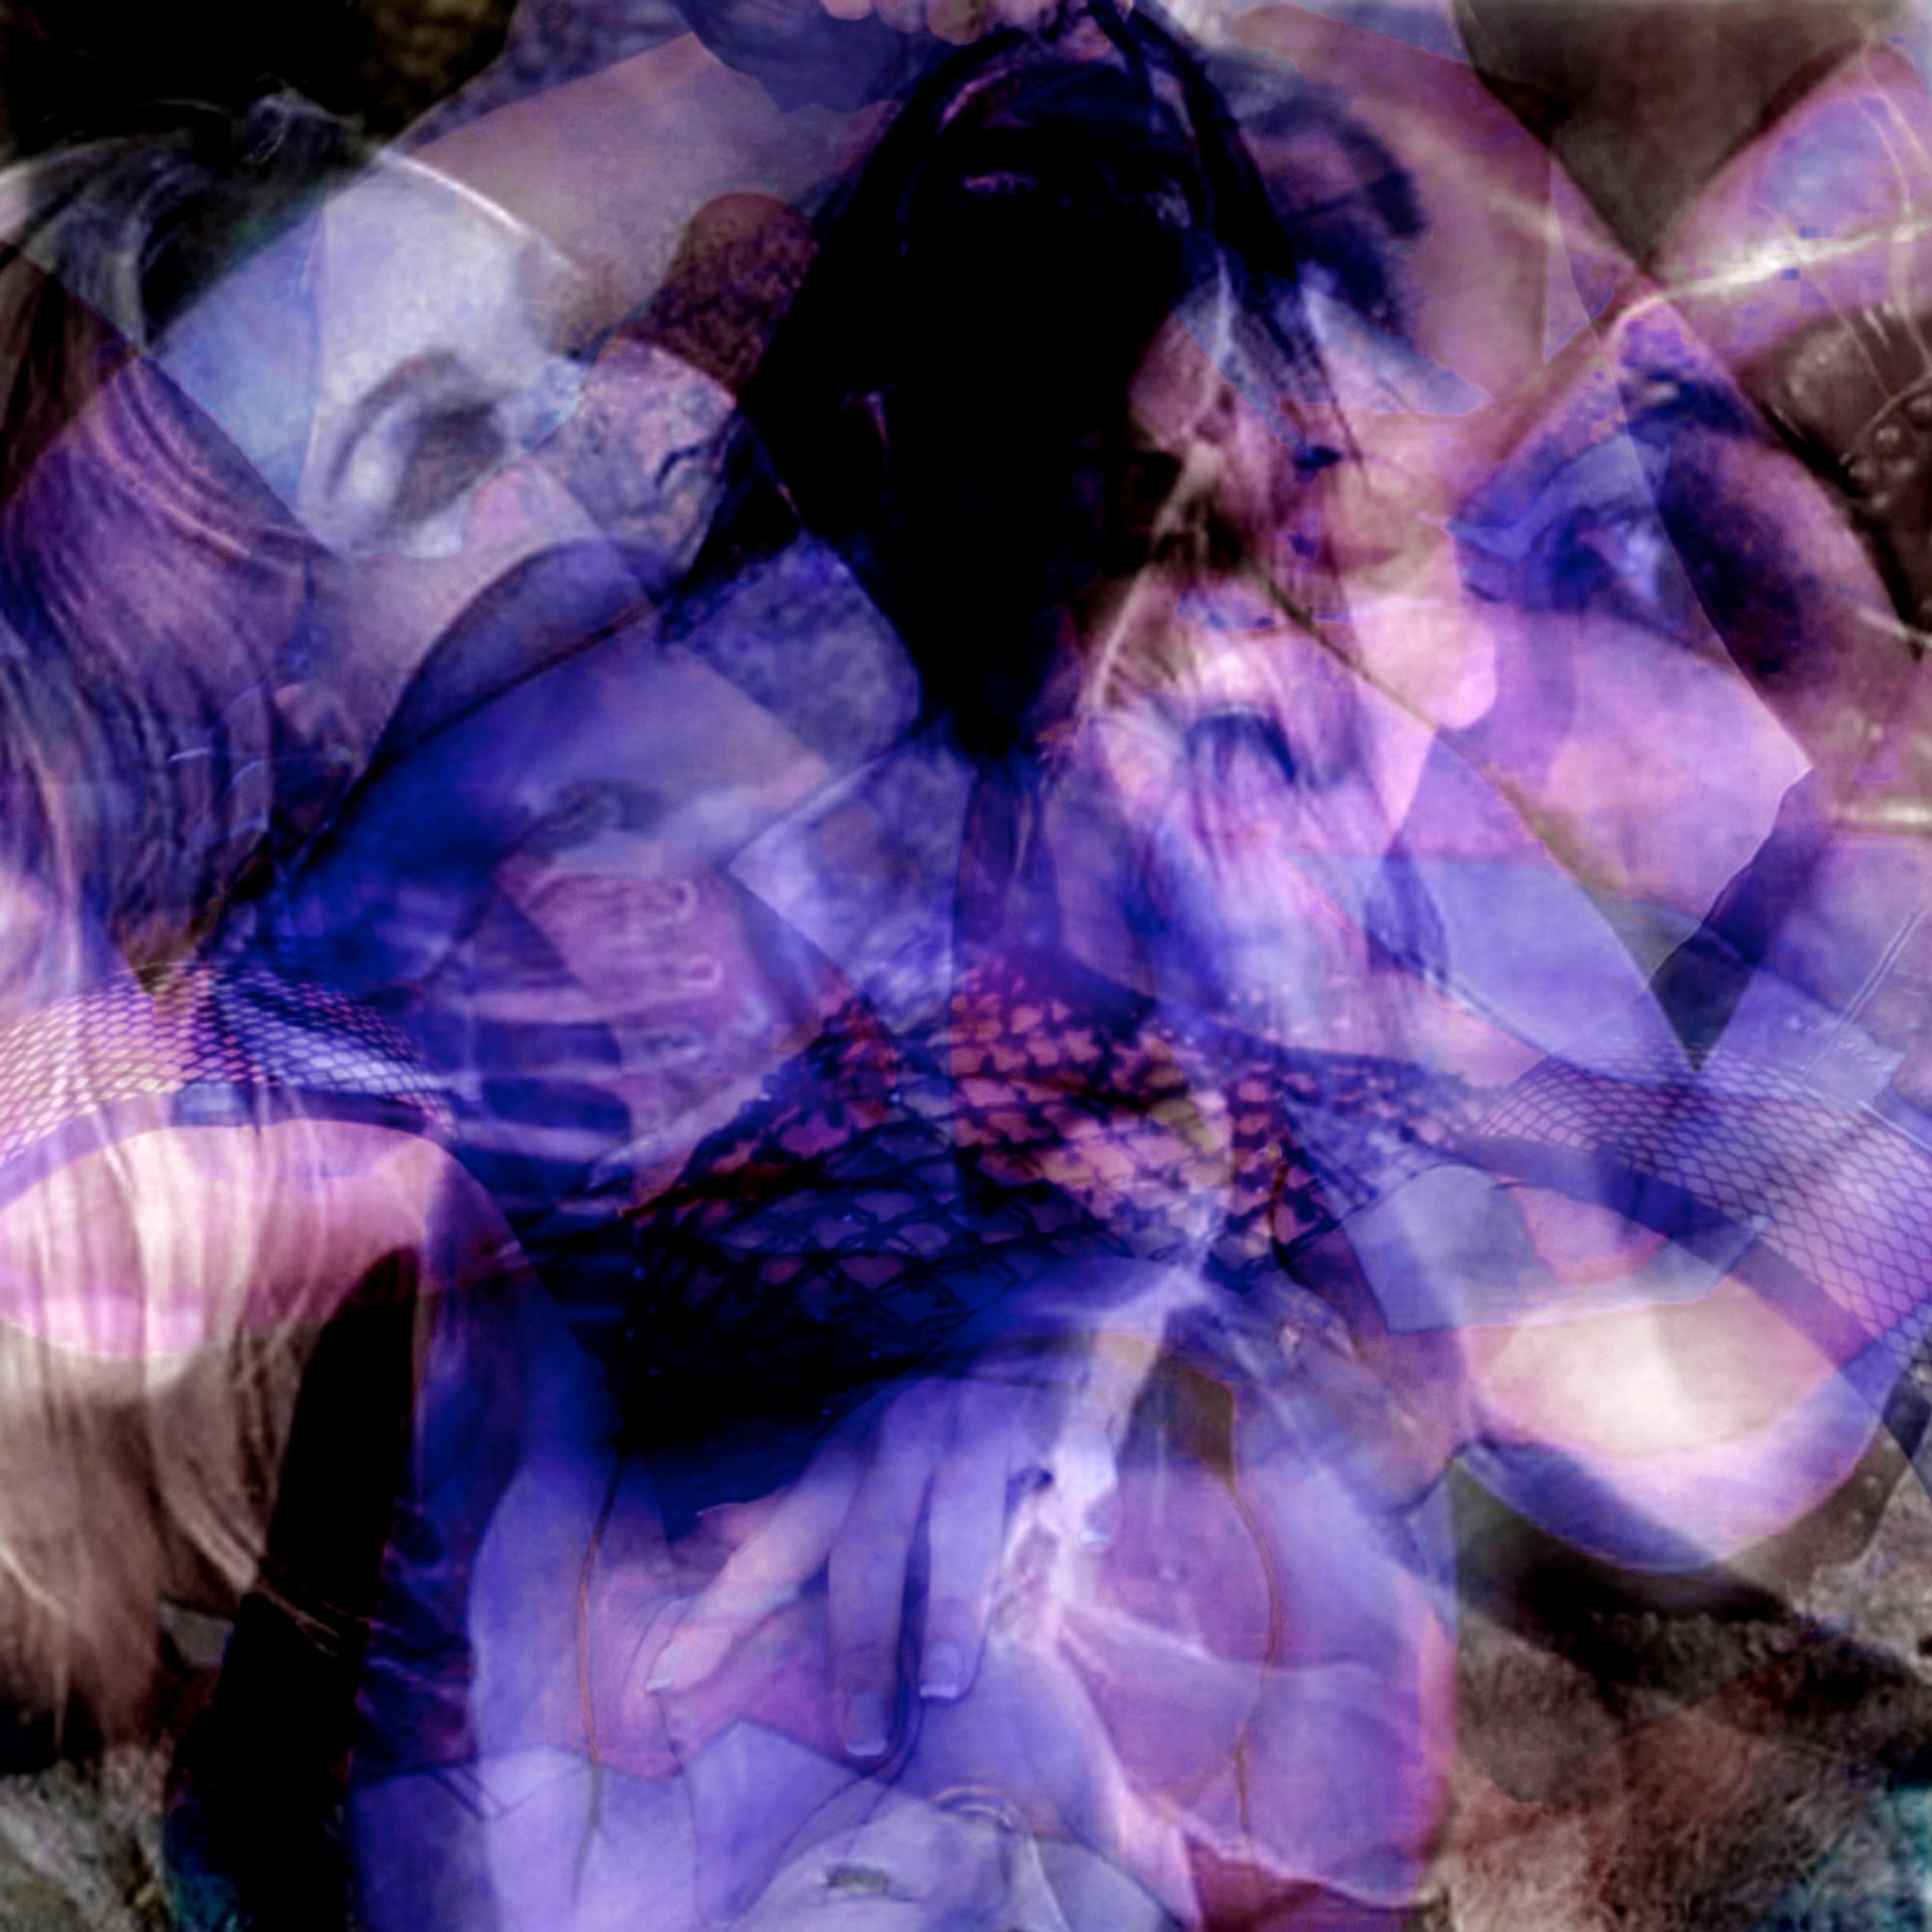 Overdose 06 (Monoptych), 2007